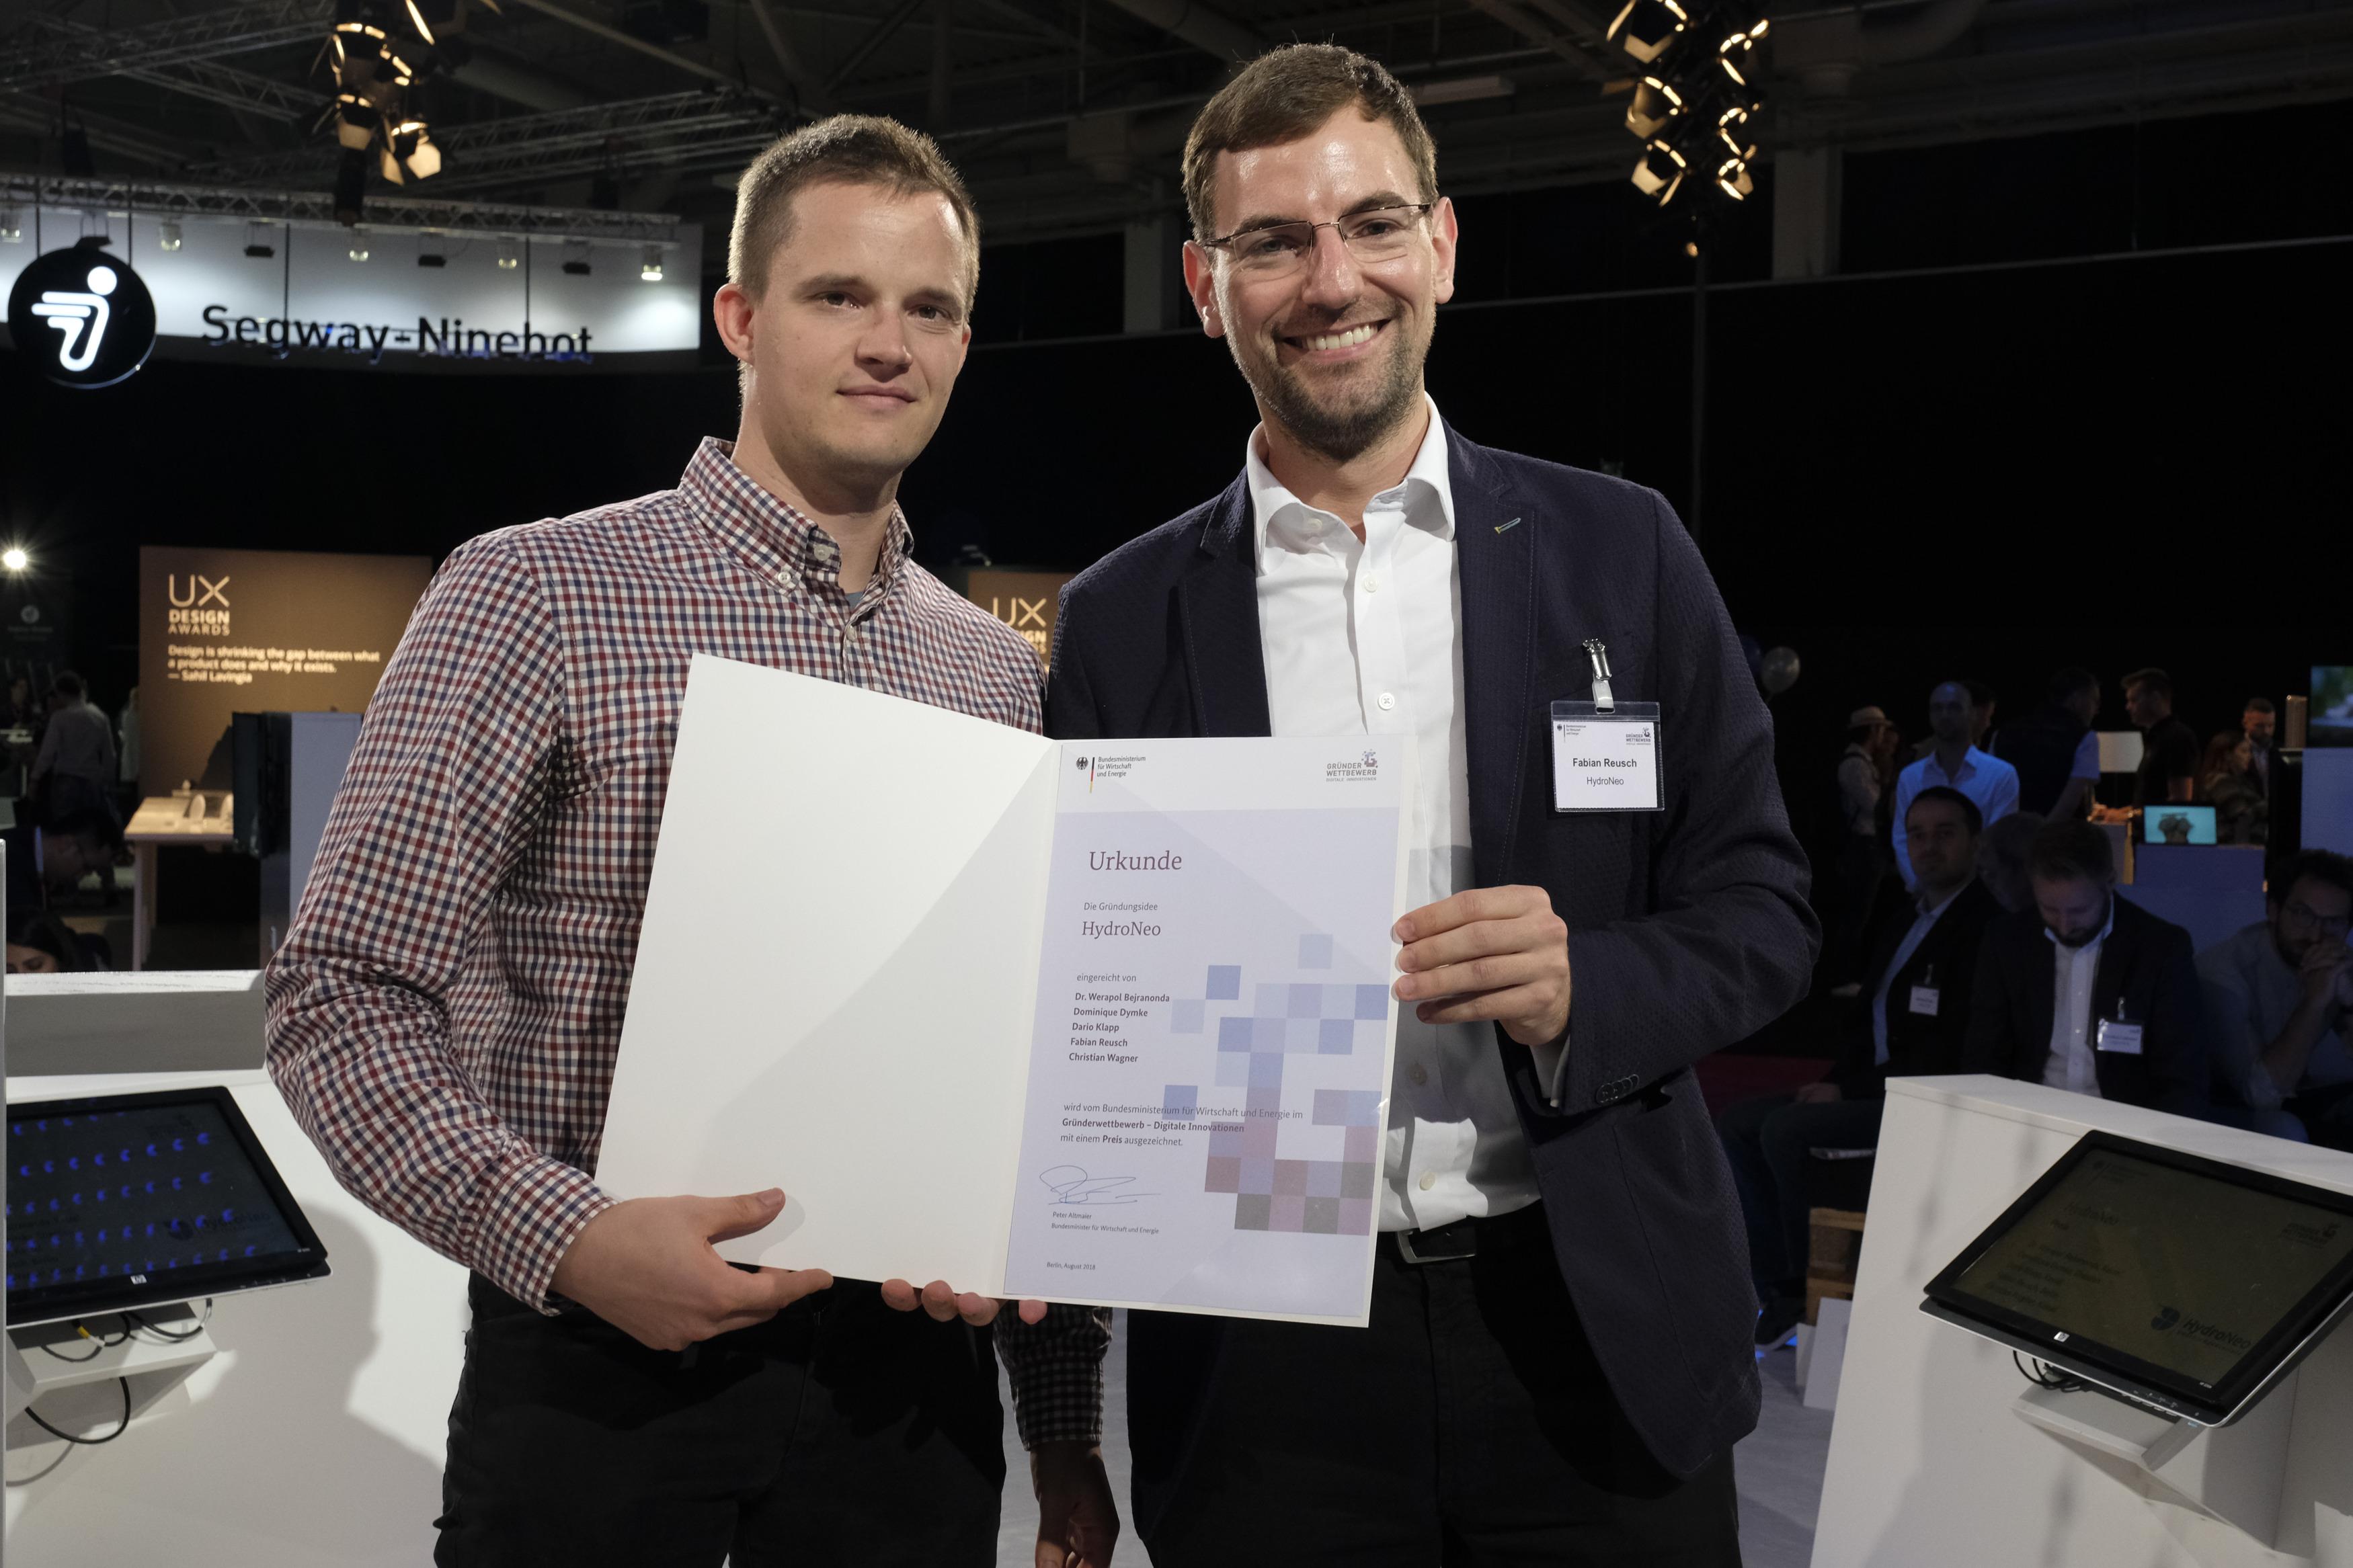 DEU, Berlin, 31.08.2018, Gründerwettbewerb Digitale Innovationen, Preisverleihung auf der IFA 2018,  [ (c) Wolfgang Borrs,  www.borrs.de, info@borrs.de ]